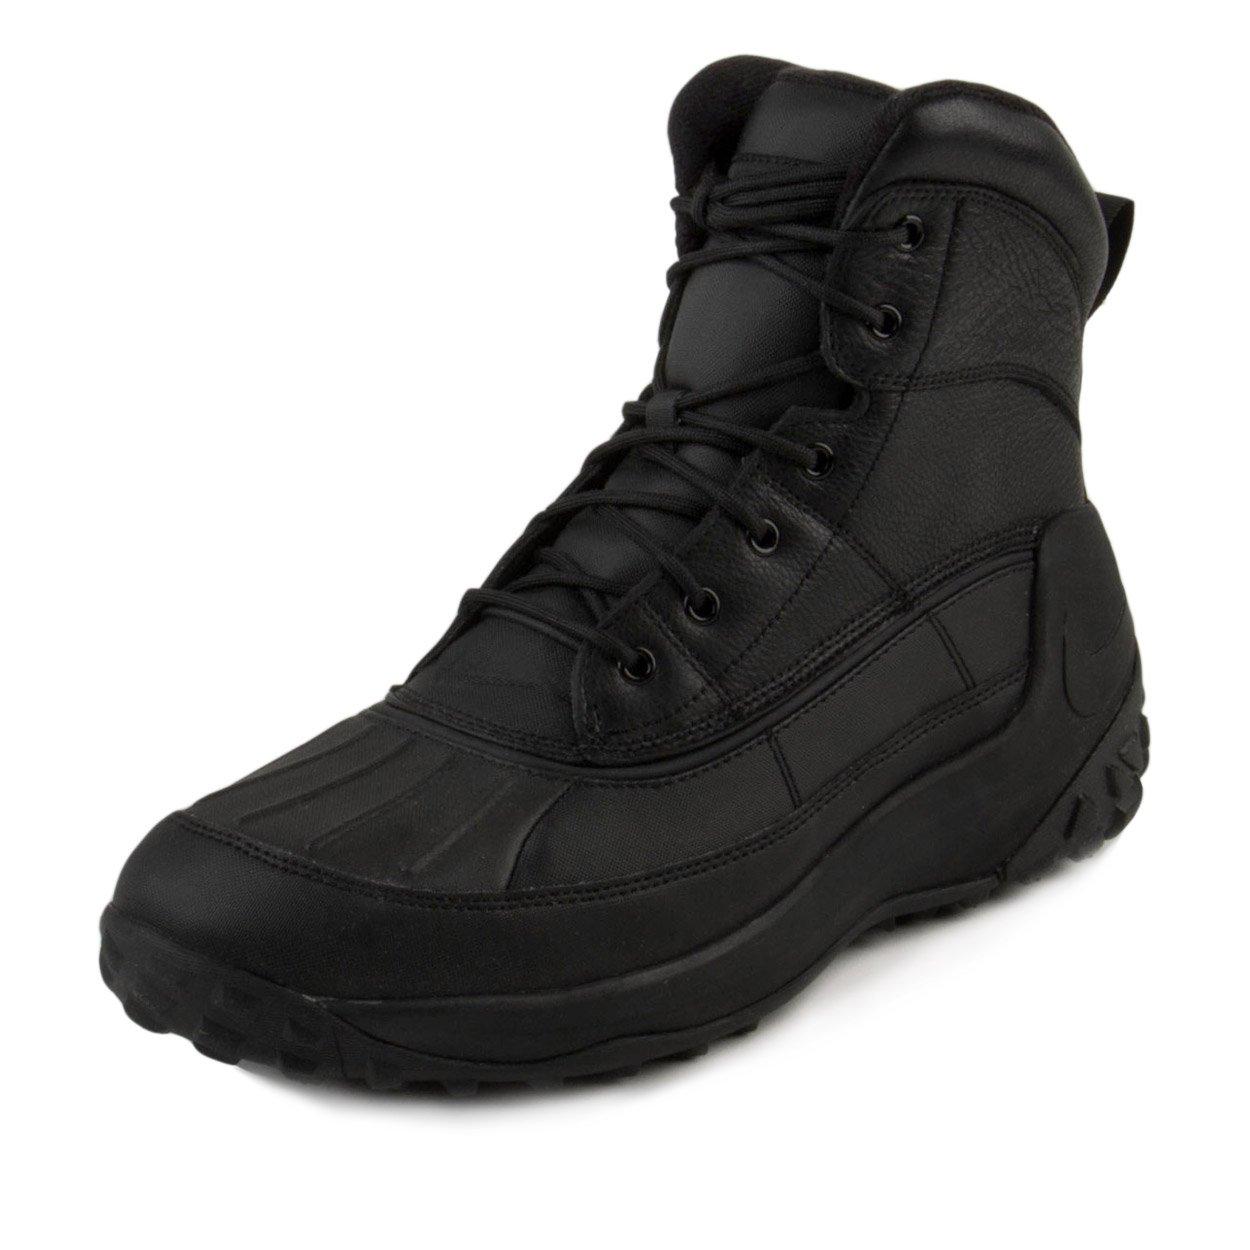 1aa151bc53 Nike Sportswear KYNWOOD Boot - Black  Amazon.ca  Shoes   Handbags